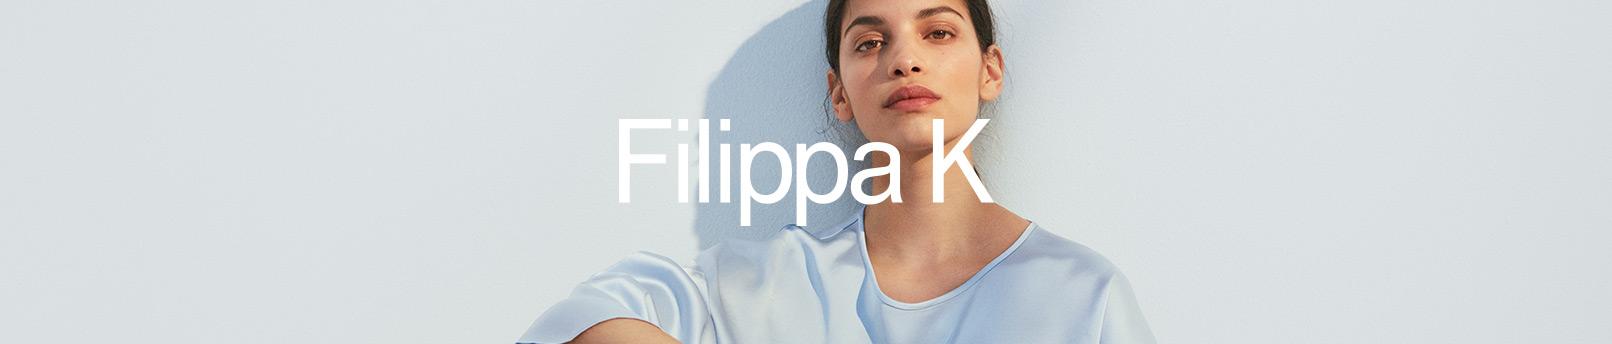 Filippa K shoppen